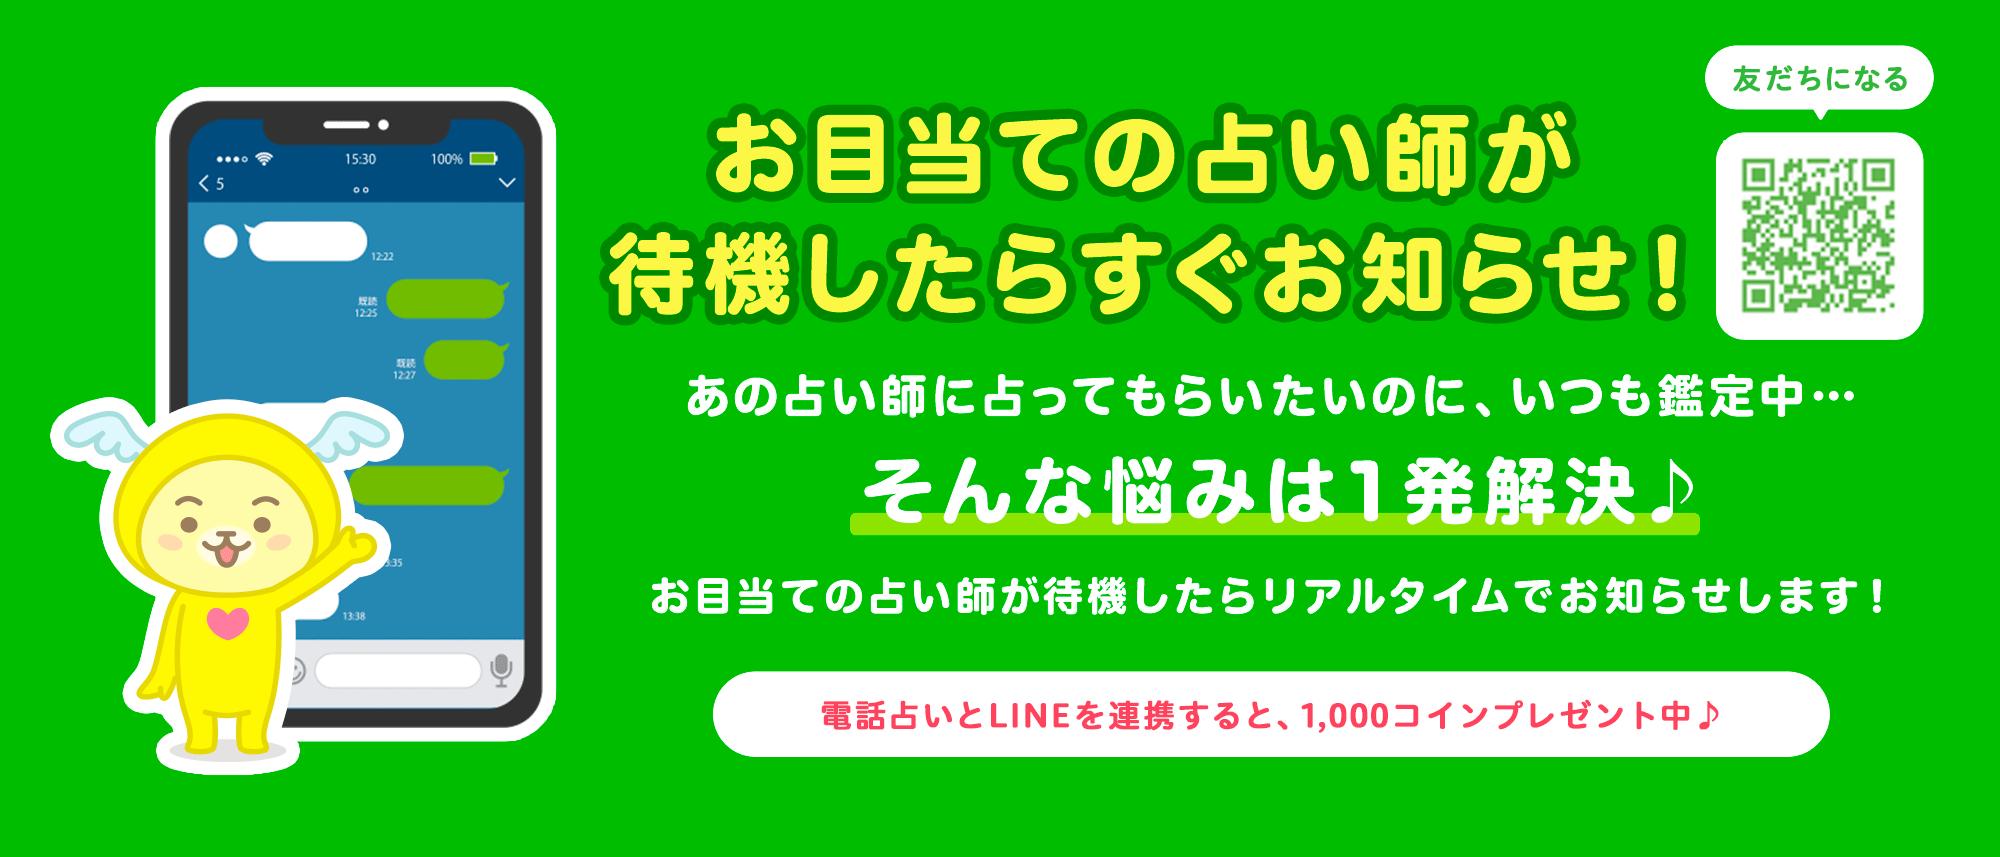 【LINE】エキサイト電話占い公式